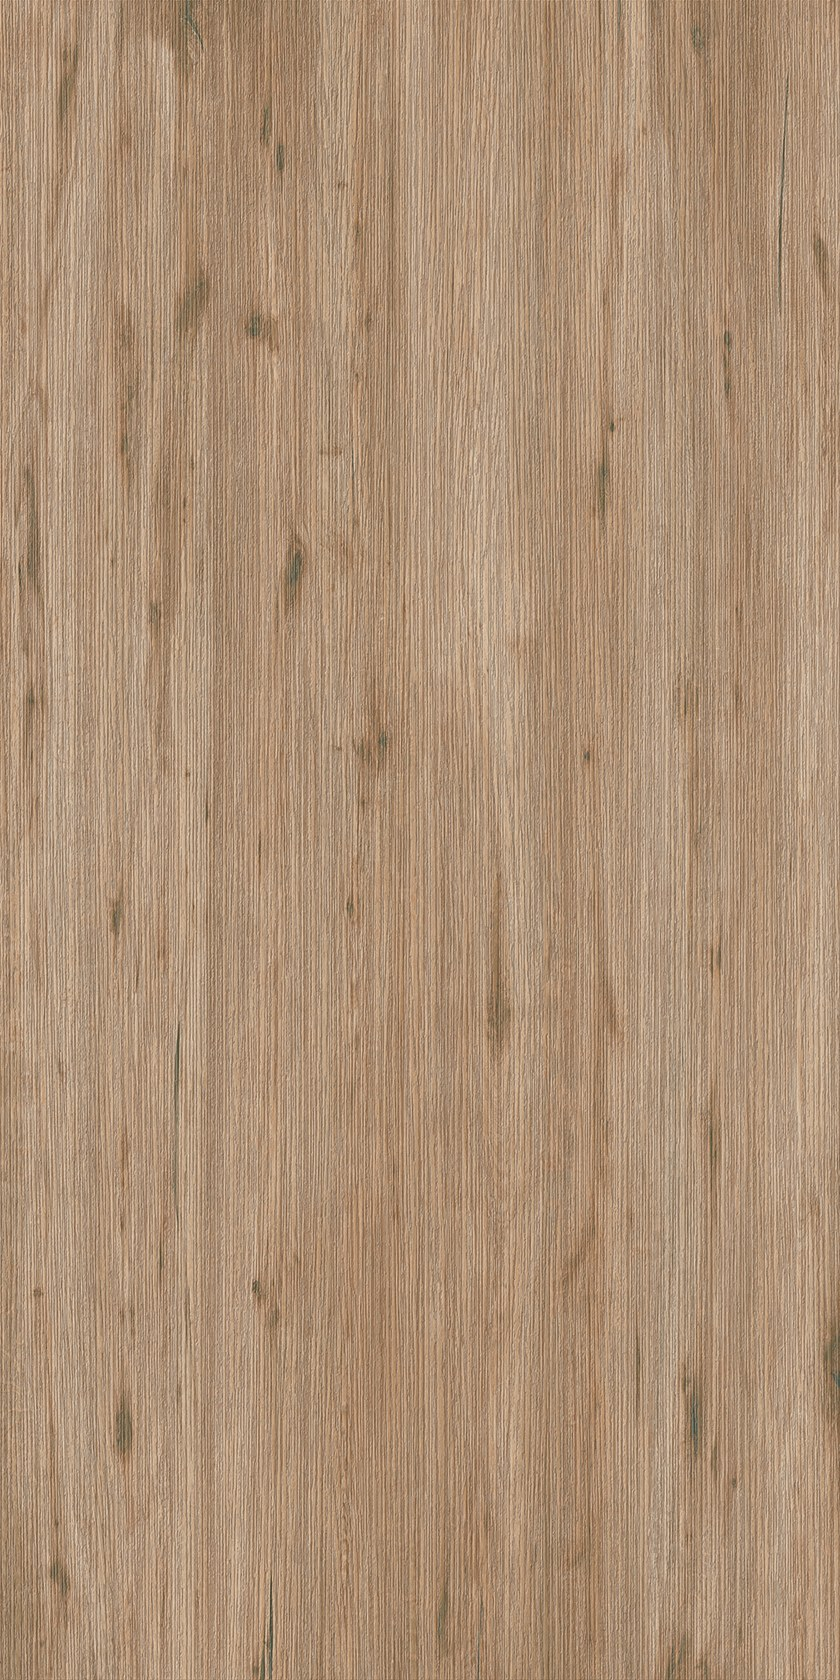 Bosco Crema Natural / Natural 150x300 cm